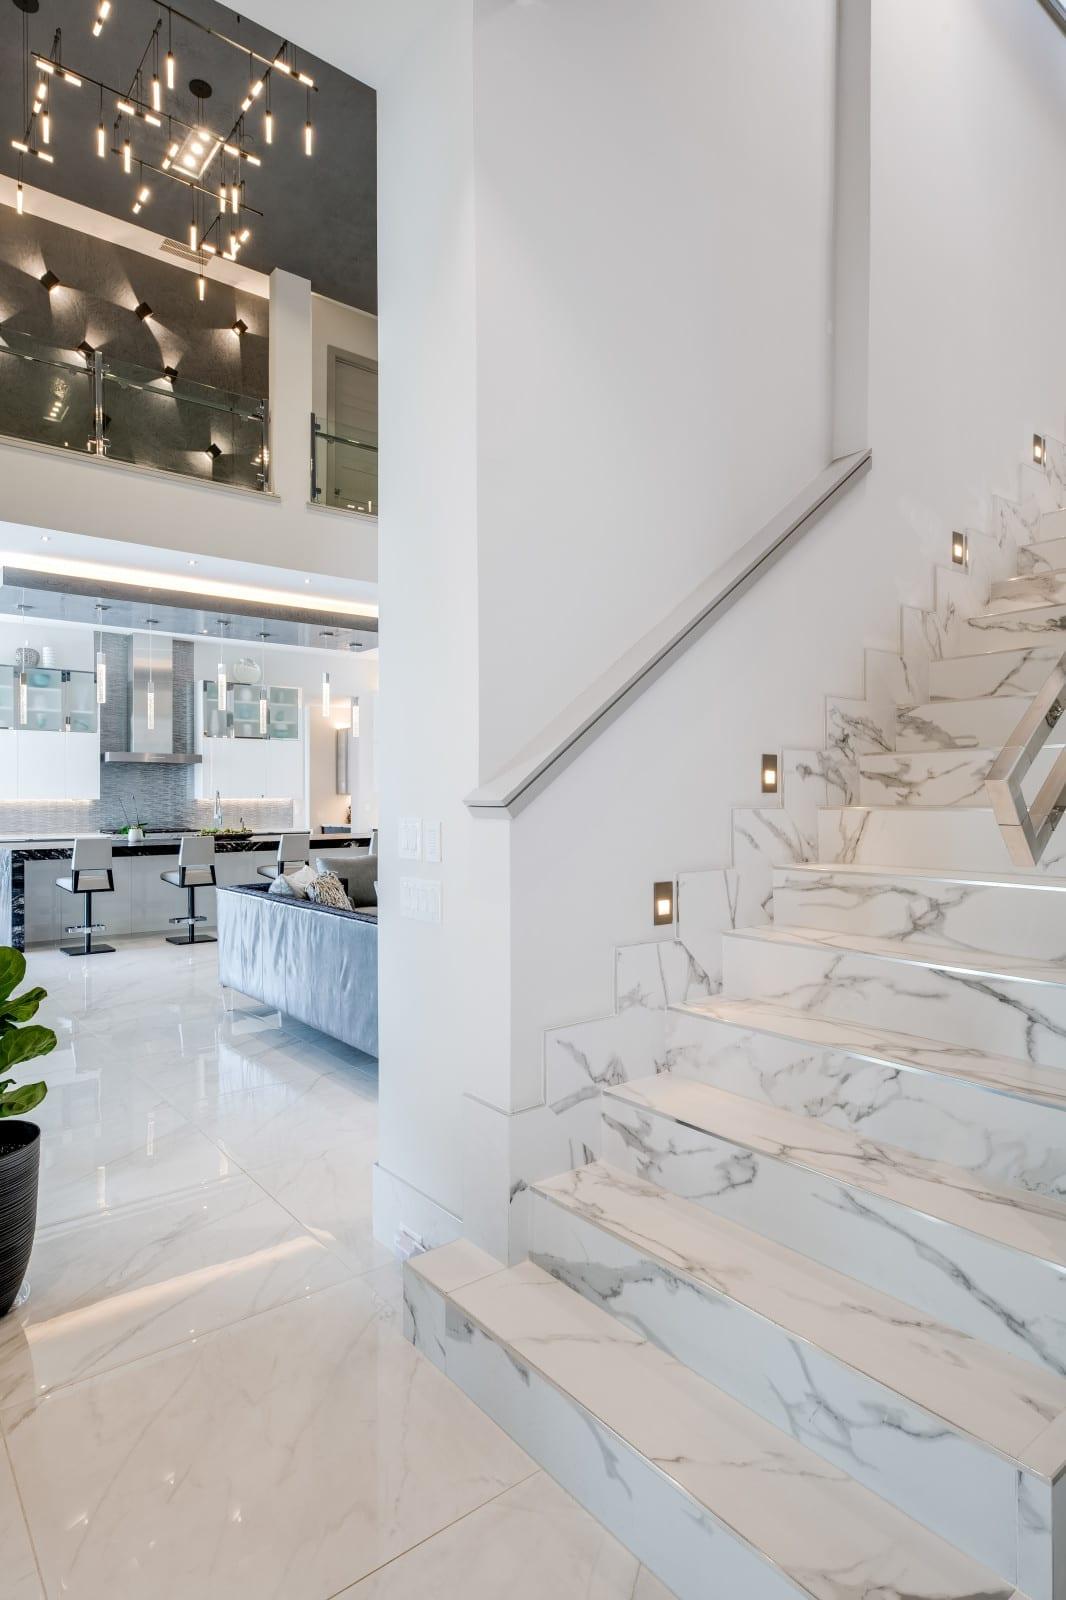 Custom Home Build and Interior Design # 17 - Millennial Design + Build, Custom Home Builders in Dallas Texas, modern style homes, Property Evaluator, Interior Designers, using BIM Technology and Home 3D Model.